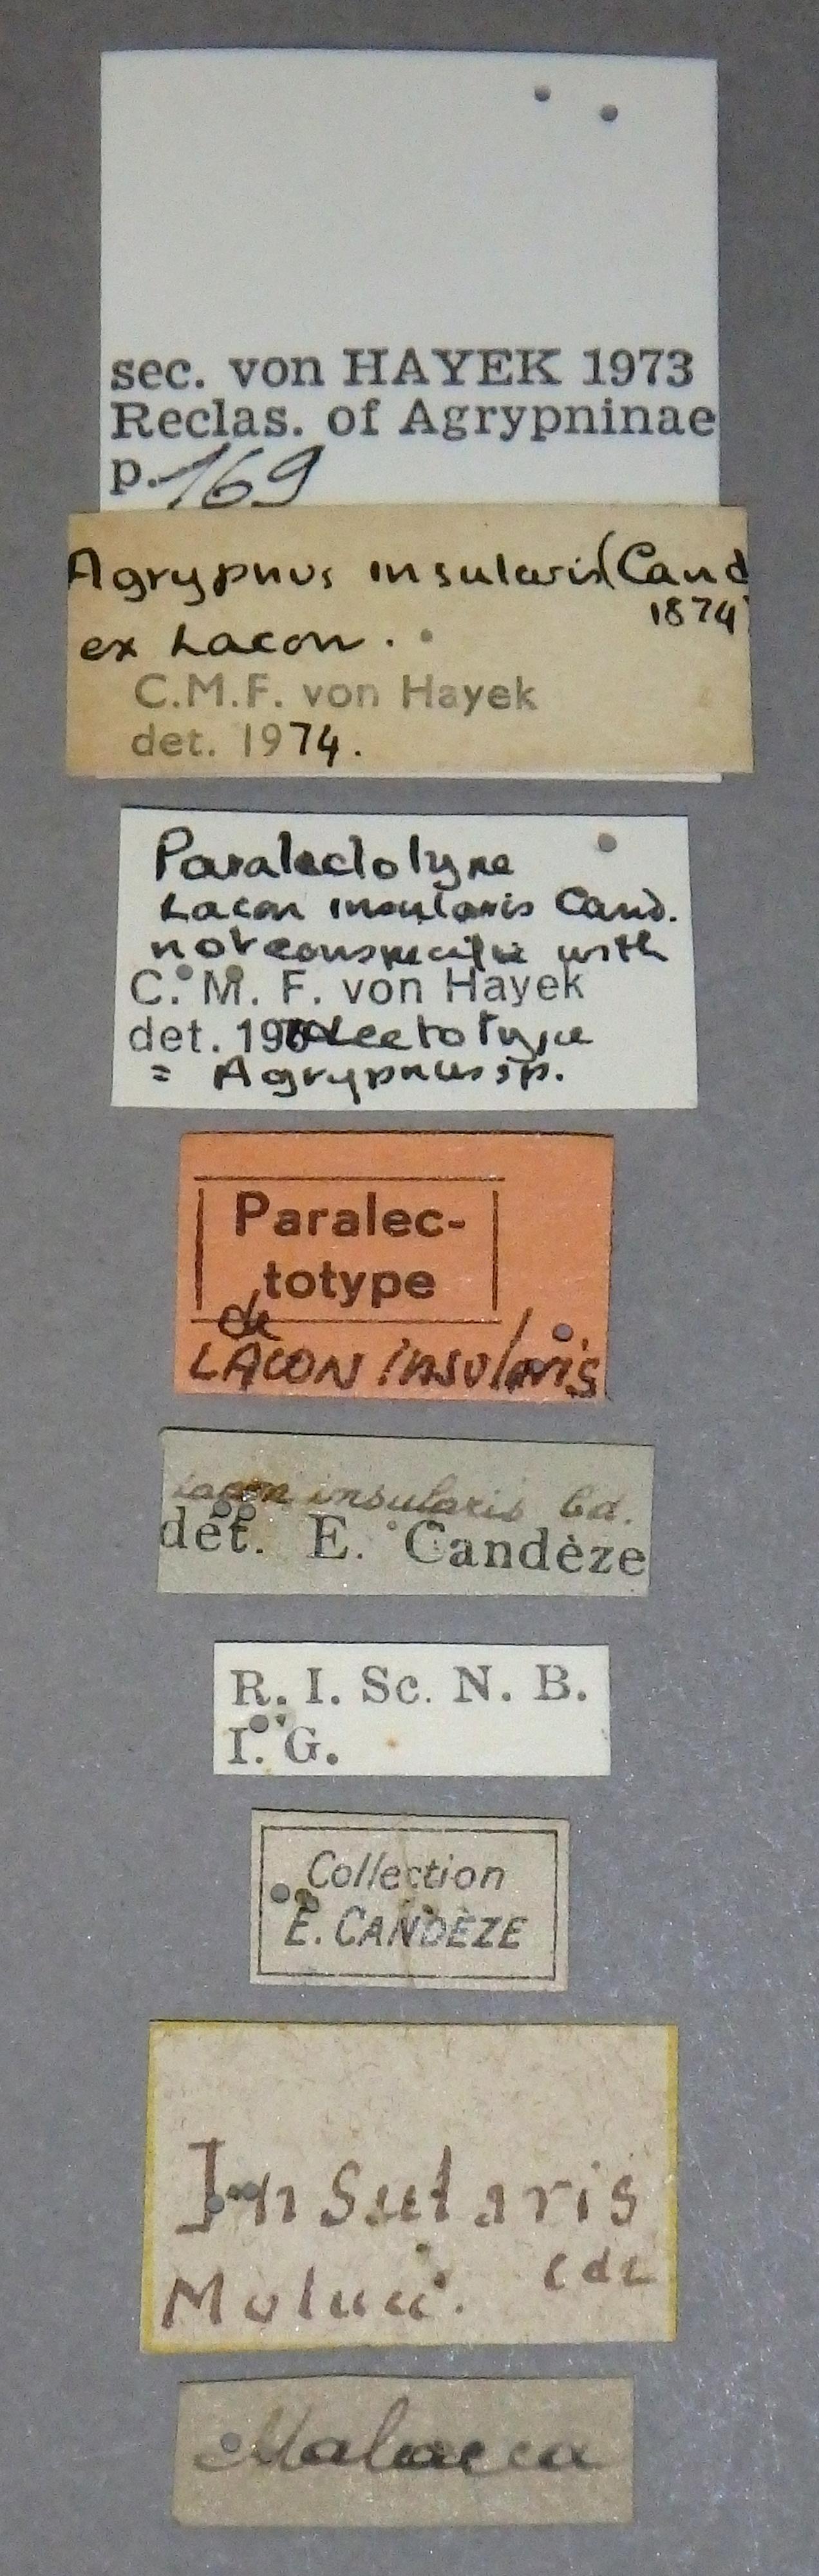 lacon insularis plt1 Lb.JPG